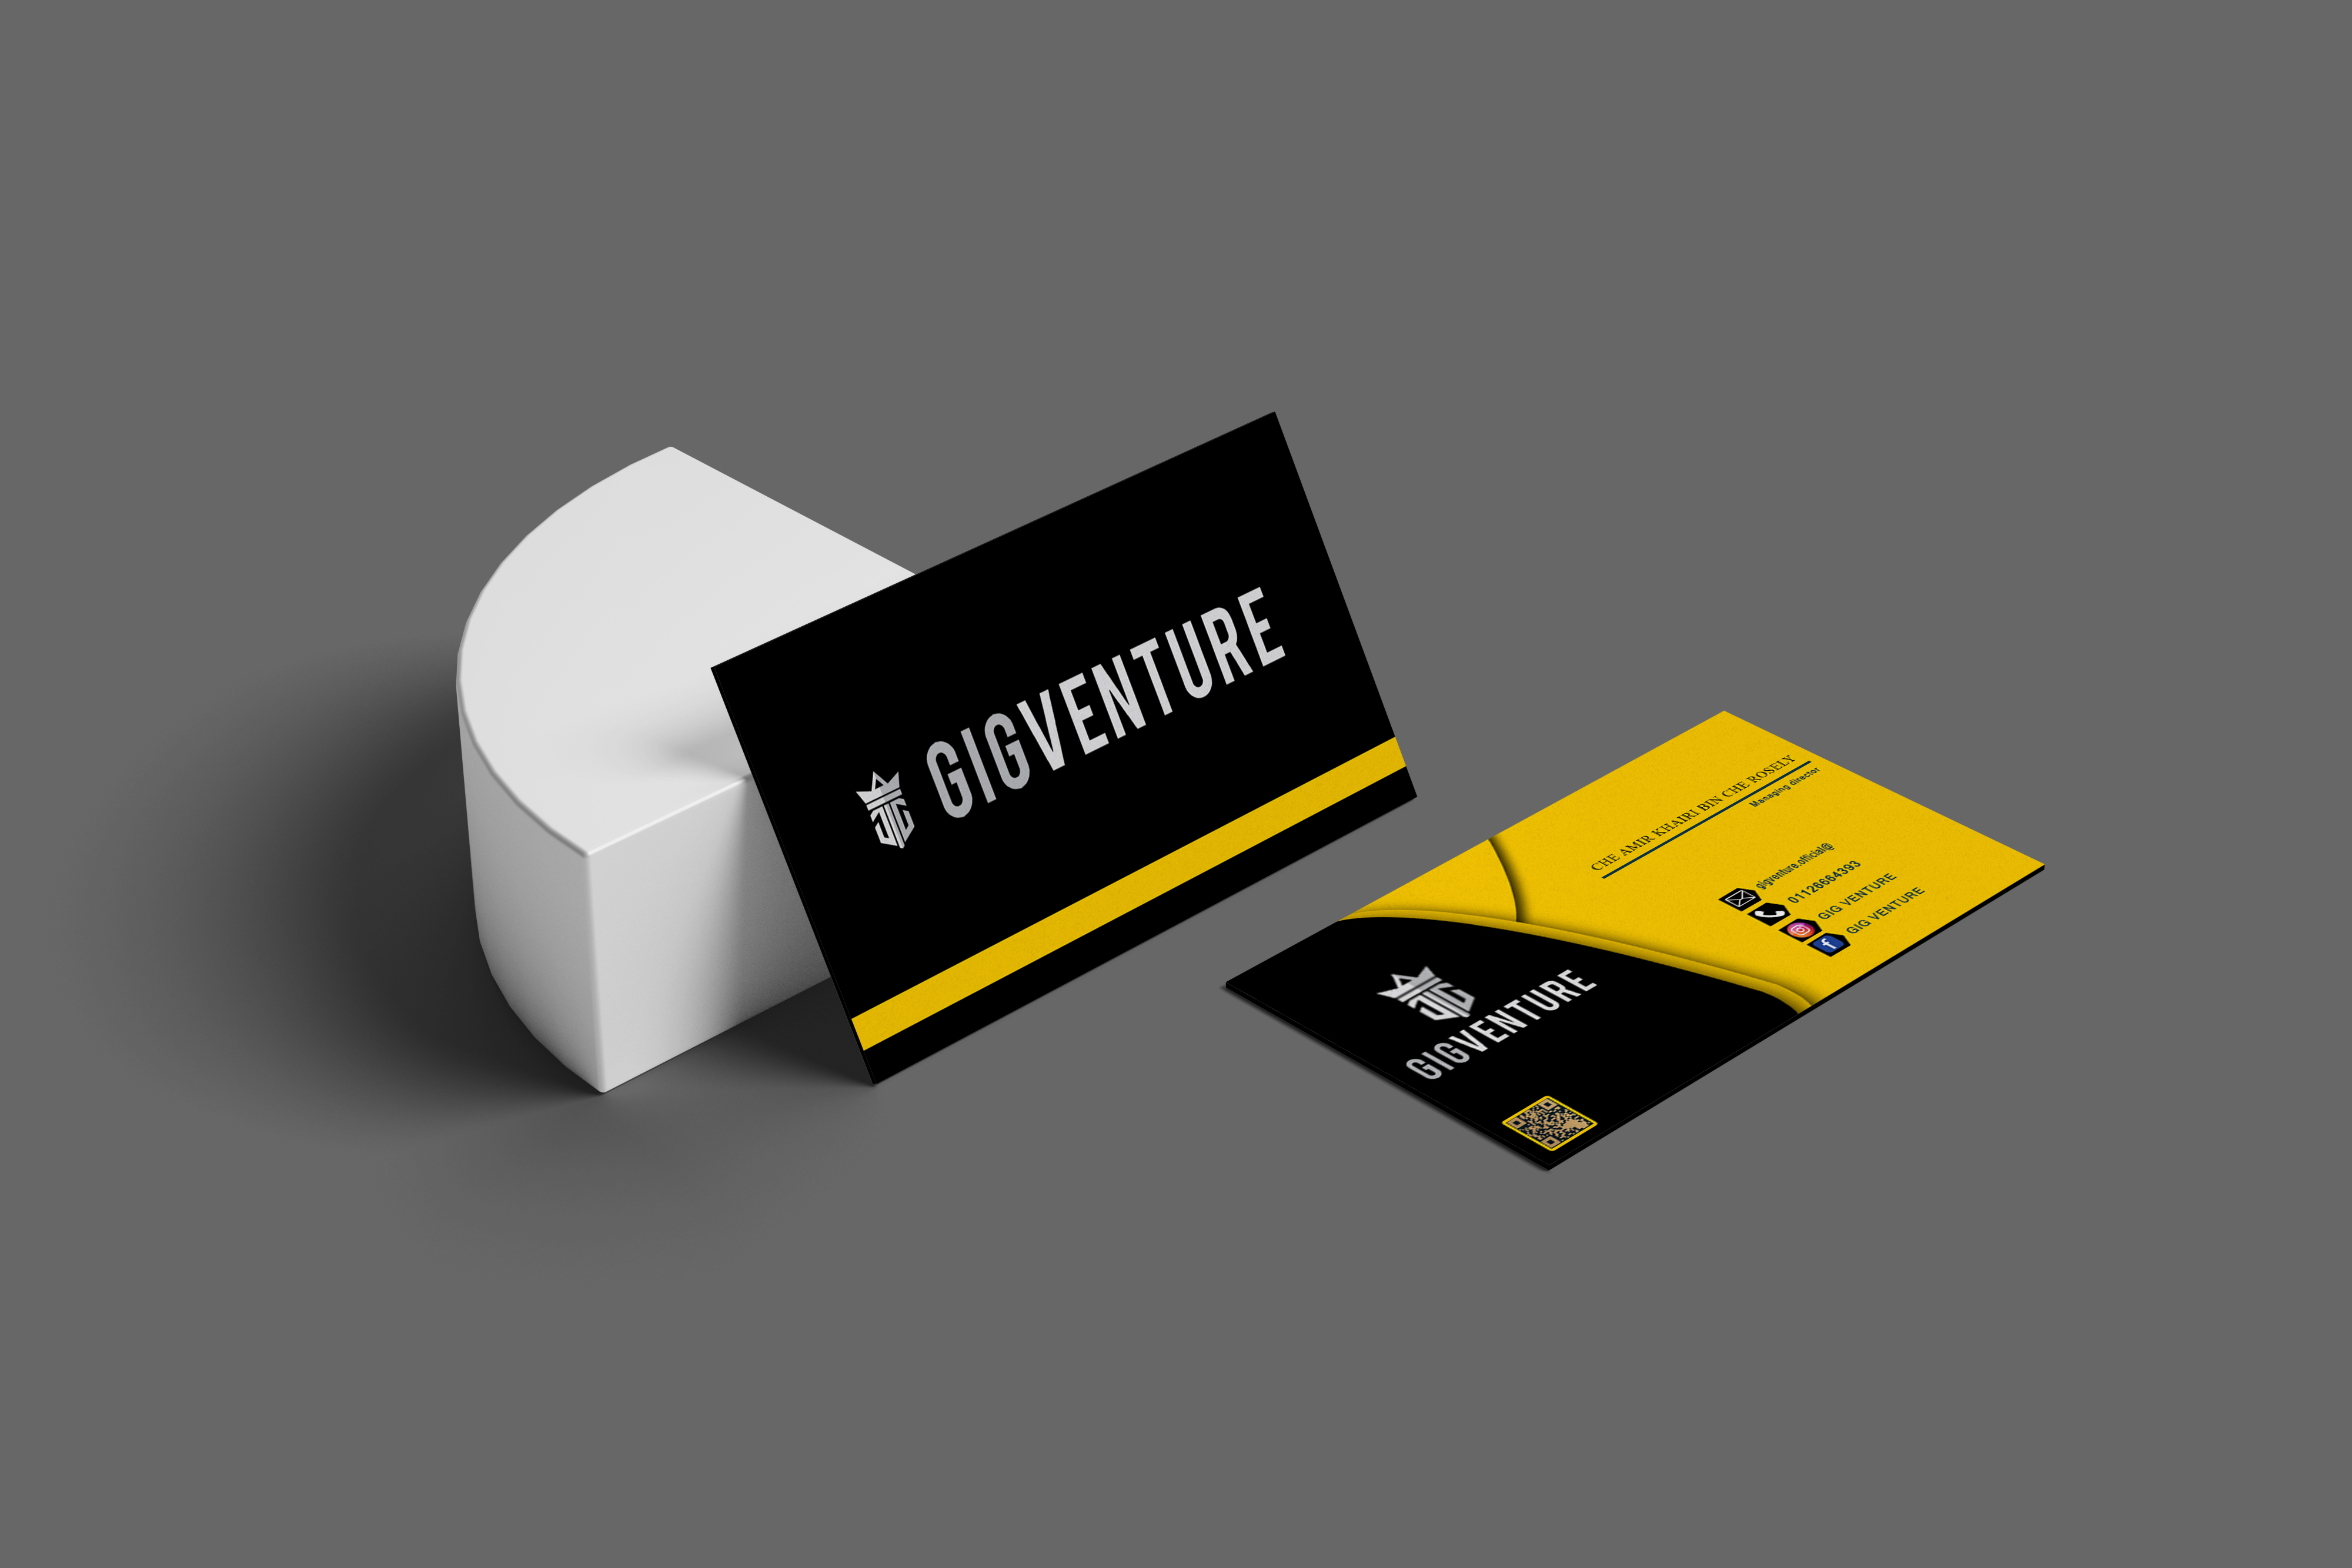 I will luxury modern minimalist business card and logo design